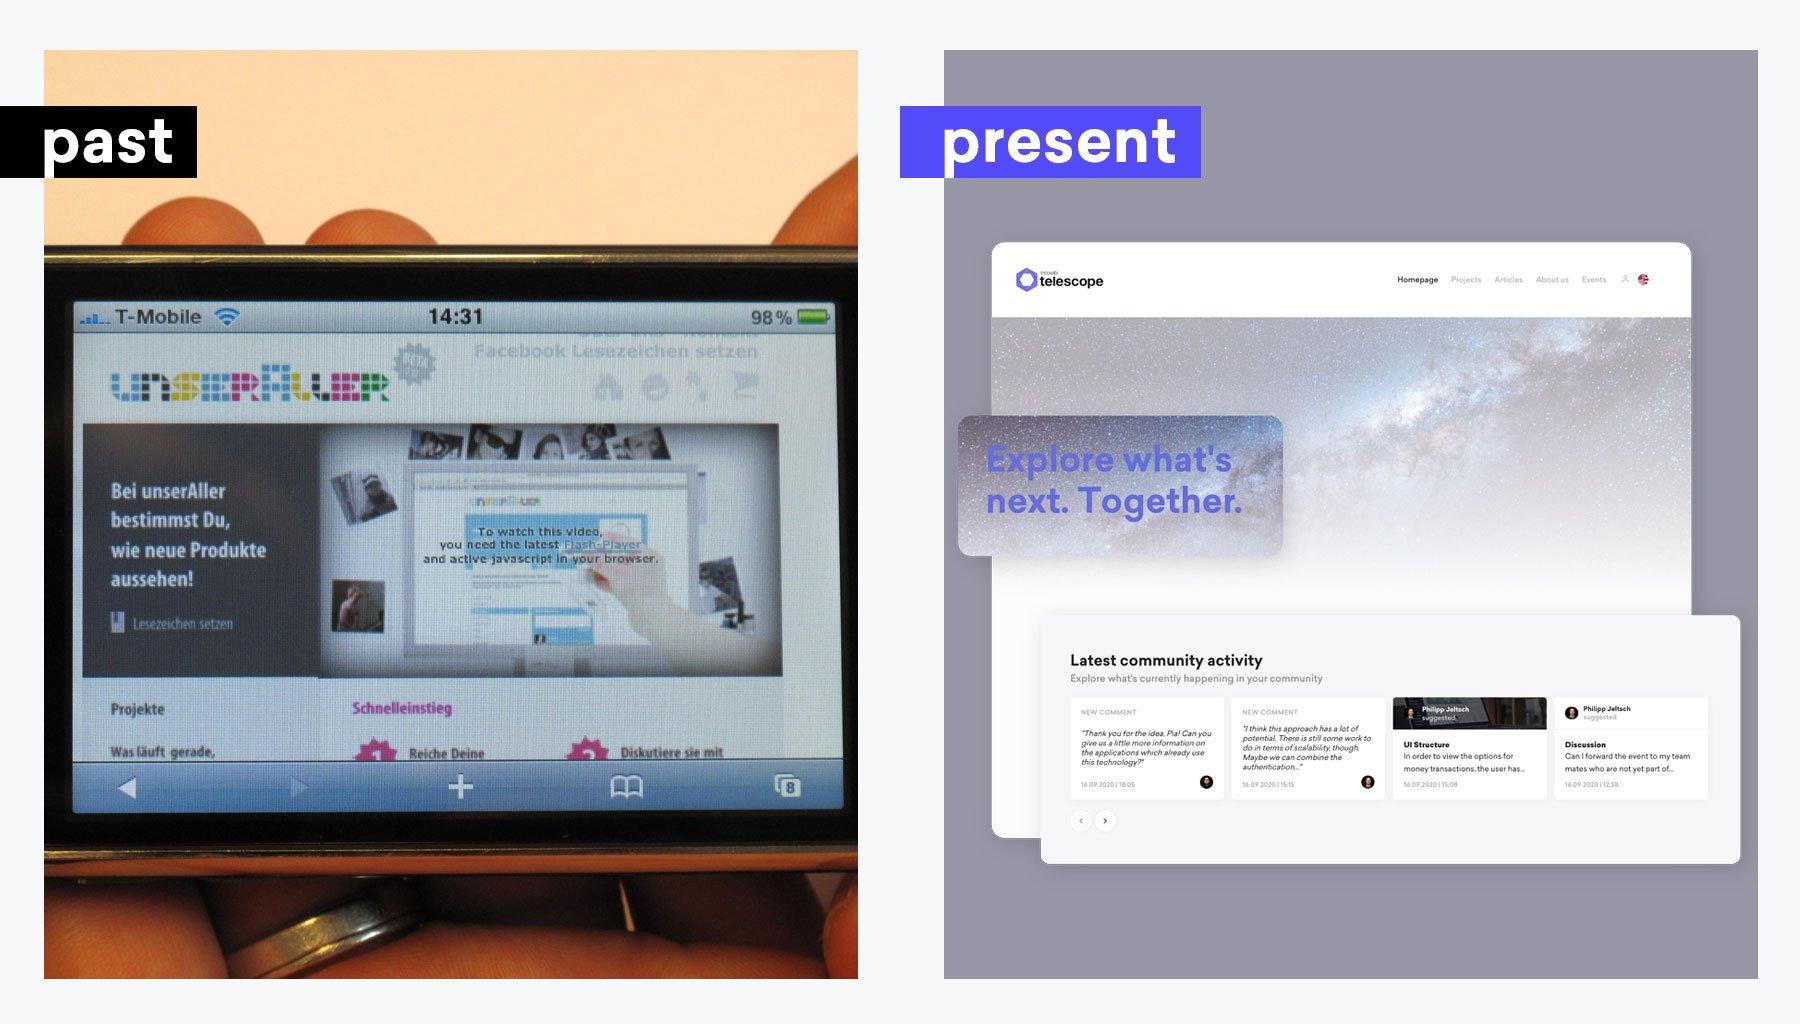 past-present-innosabi-software